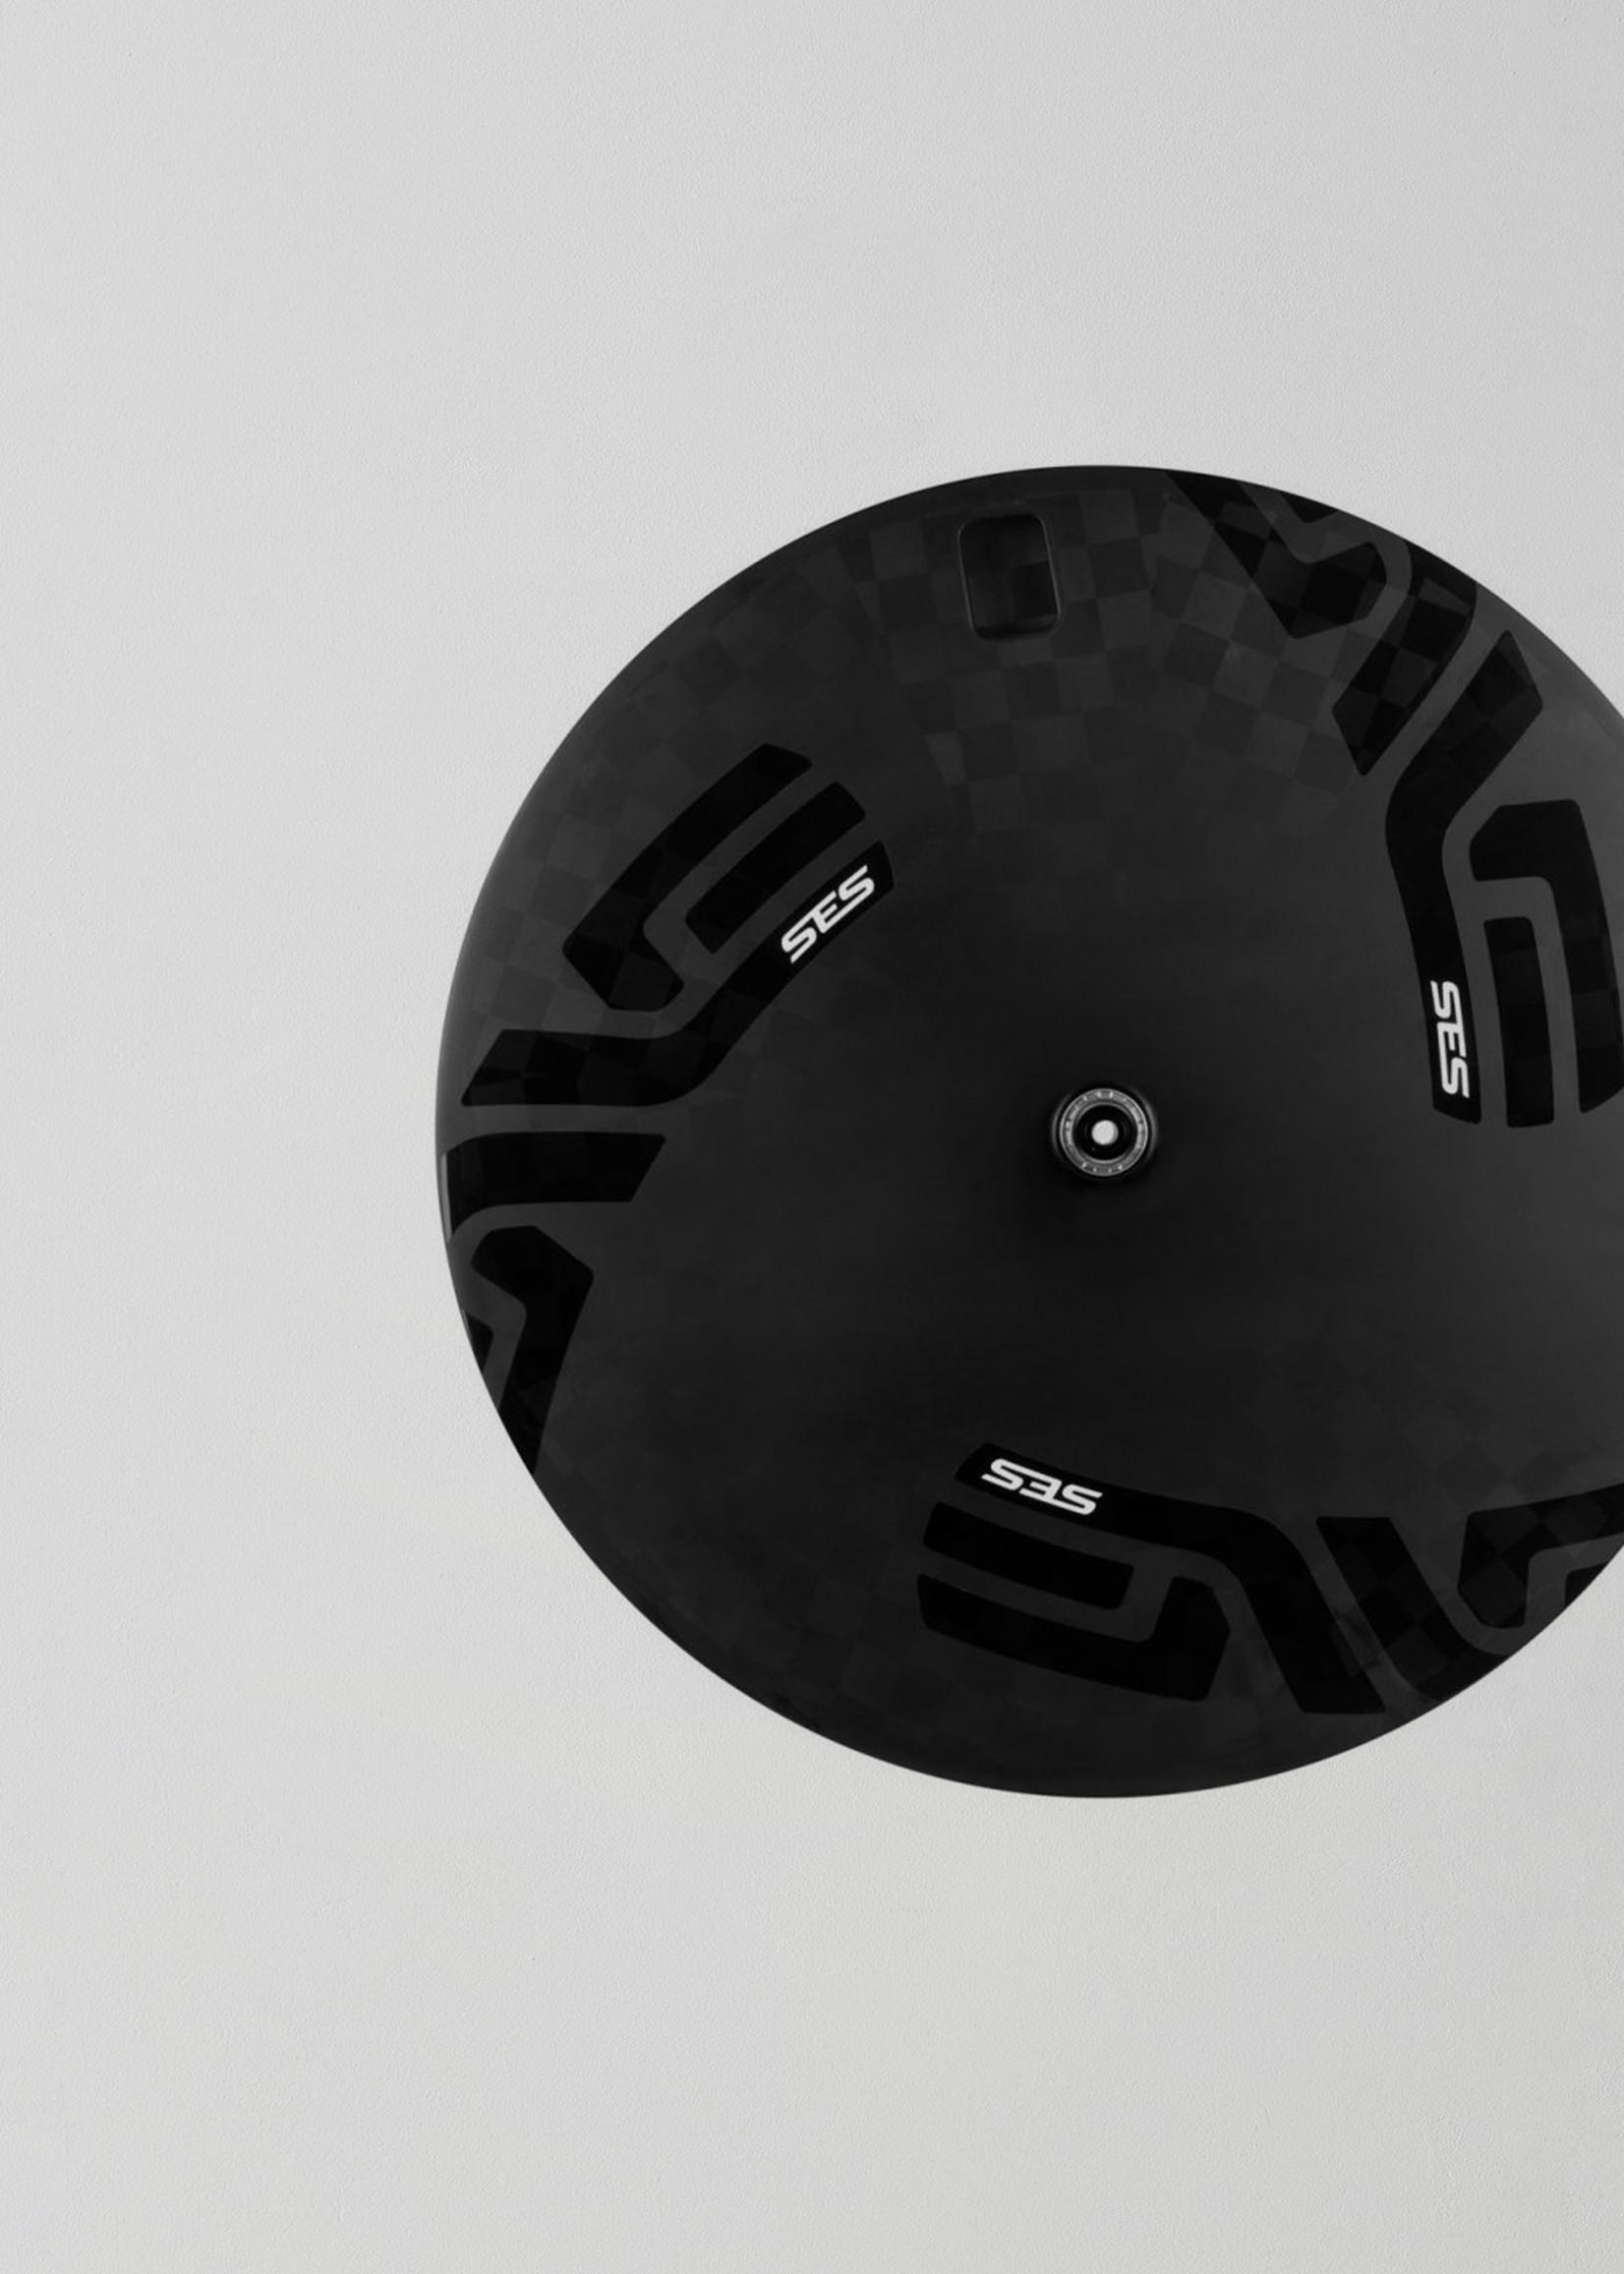 Enve SES Disc Disc Clincher (Enve hub)